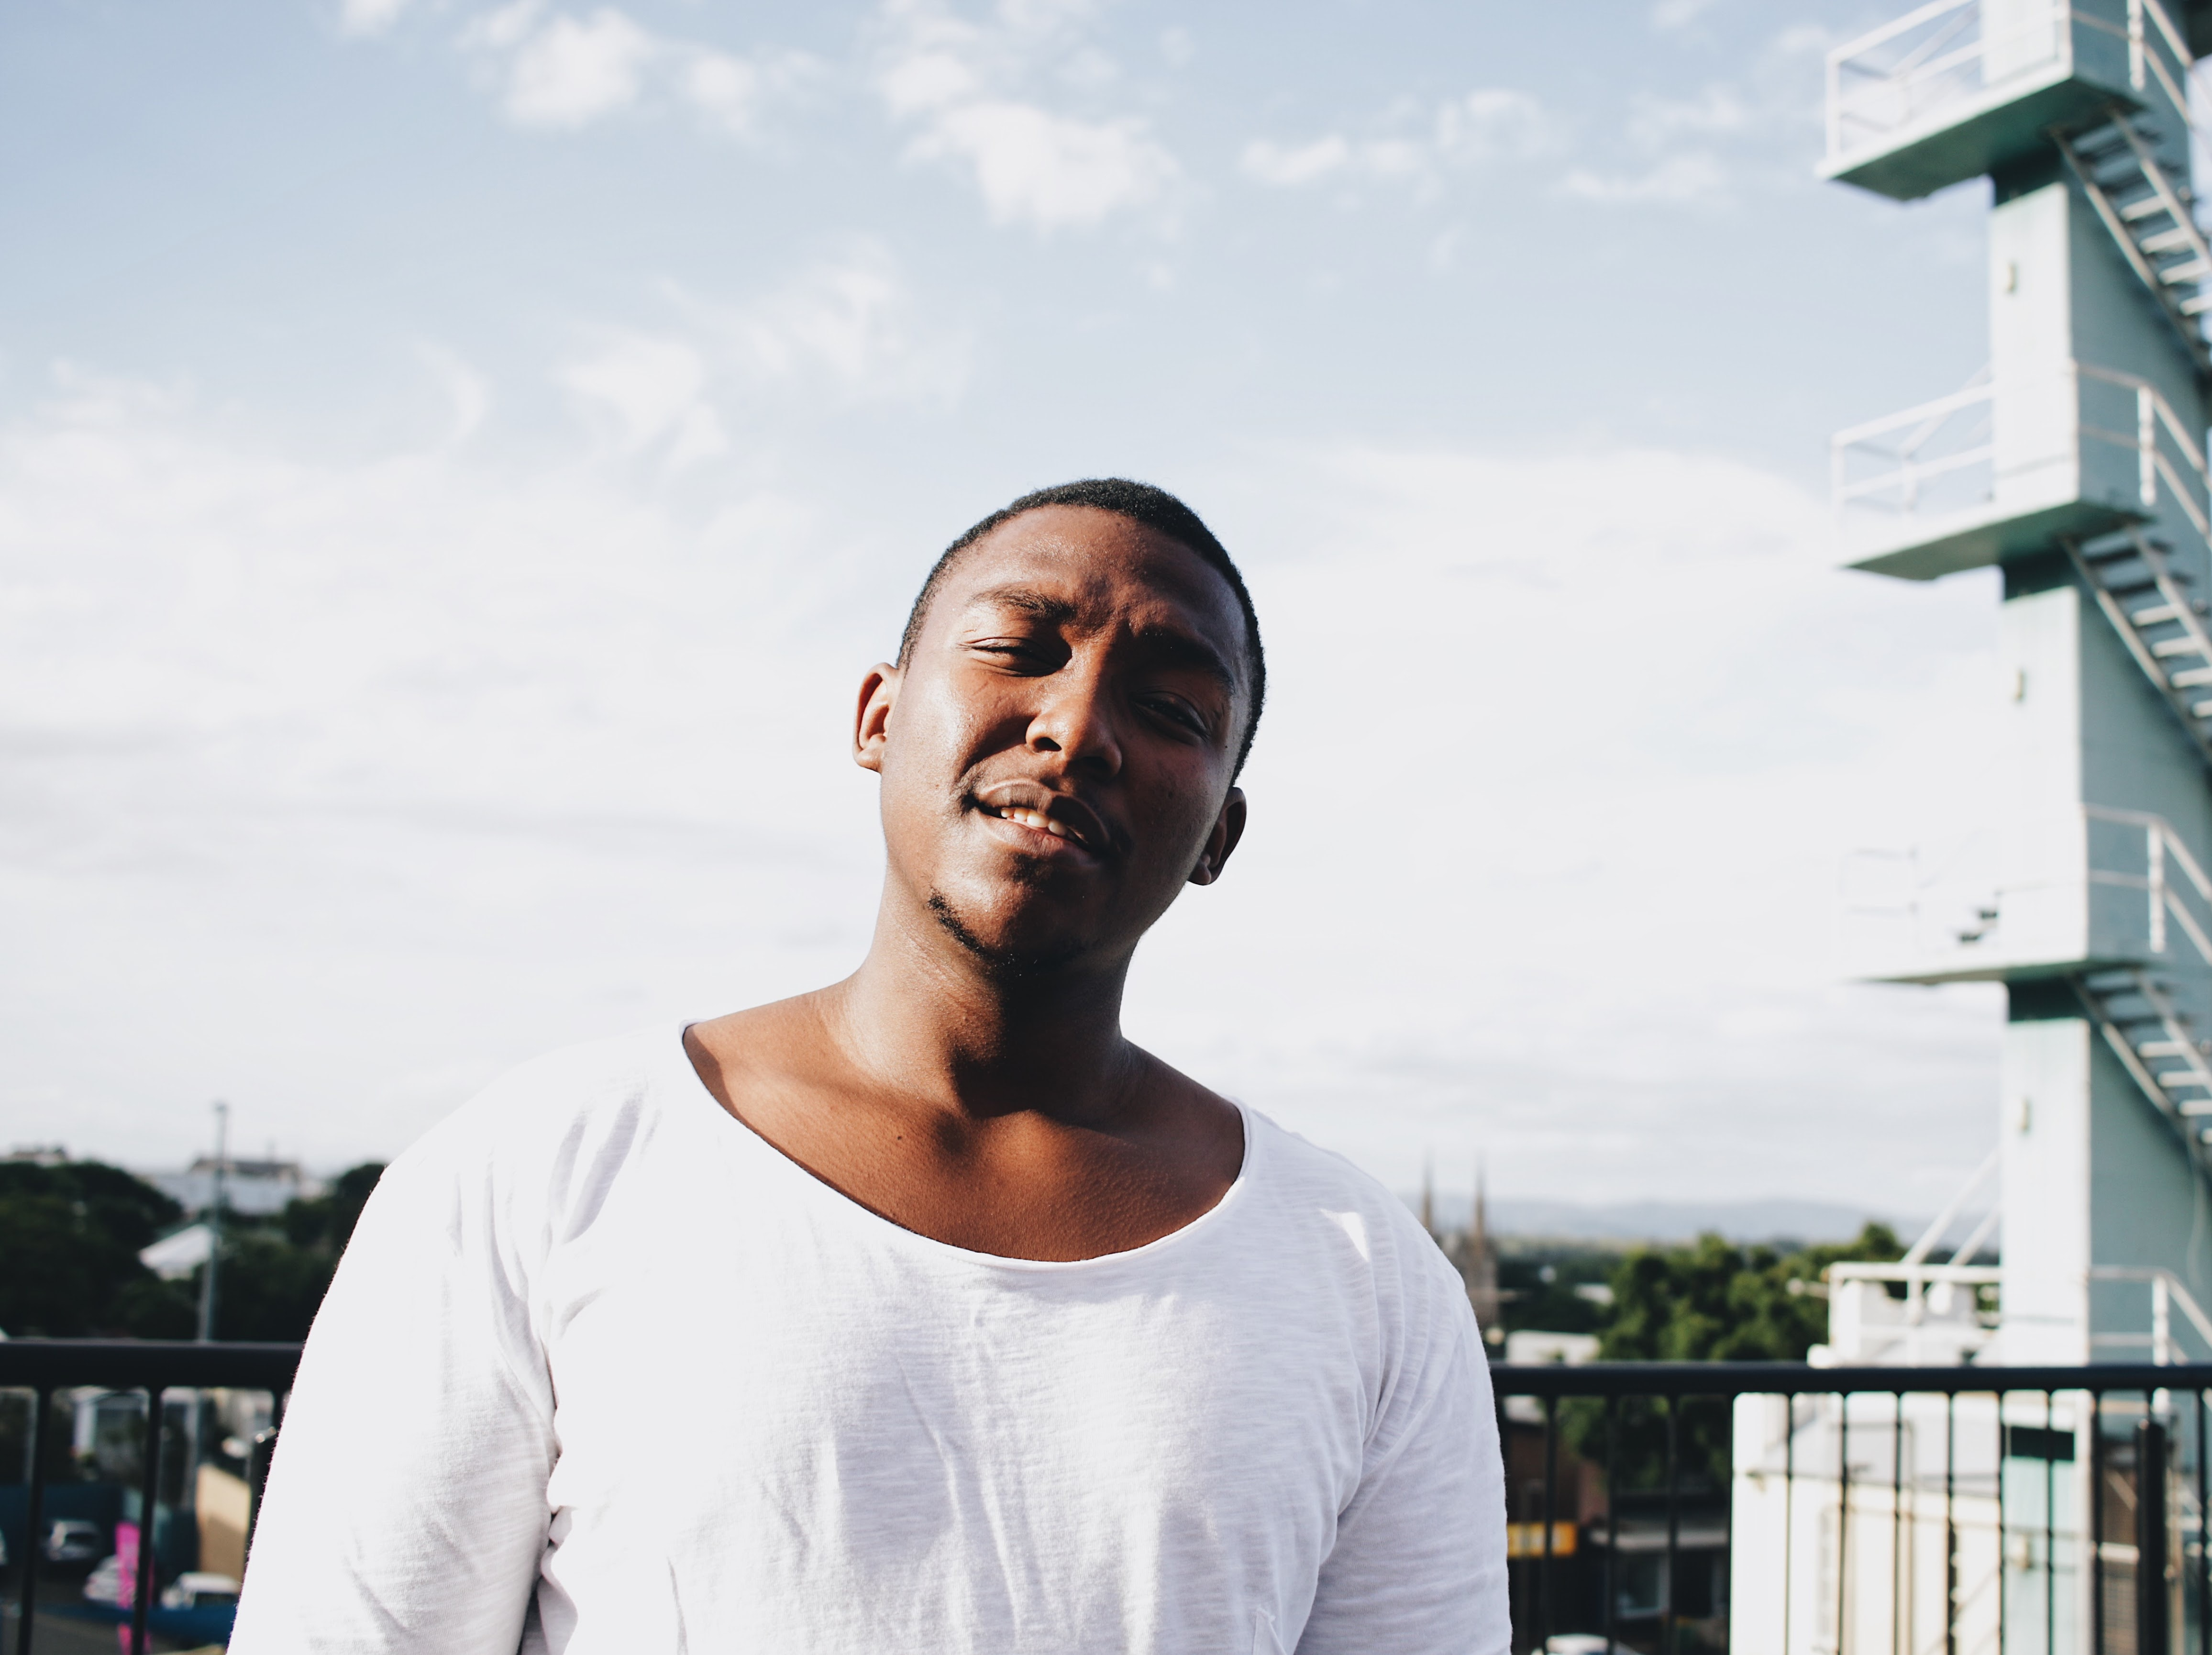 Go to Nkululeko Jonas's profile